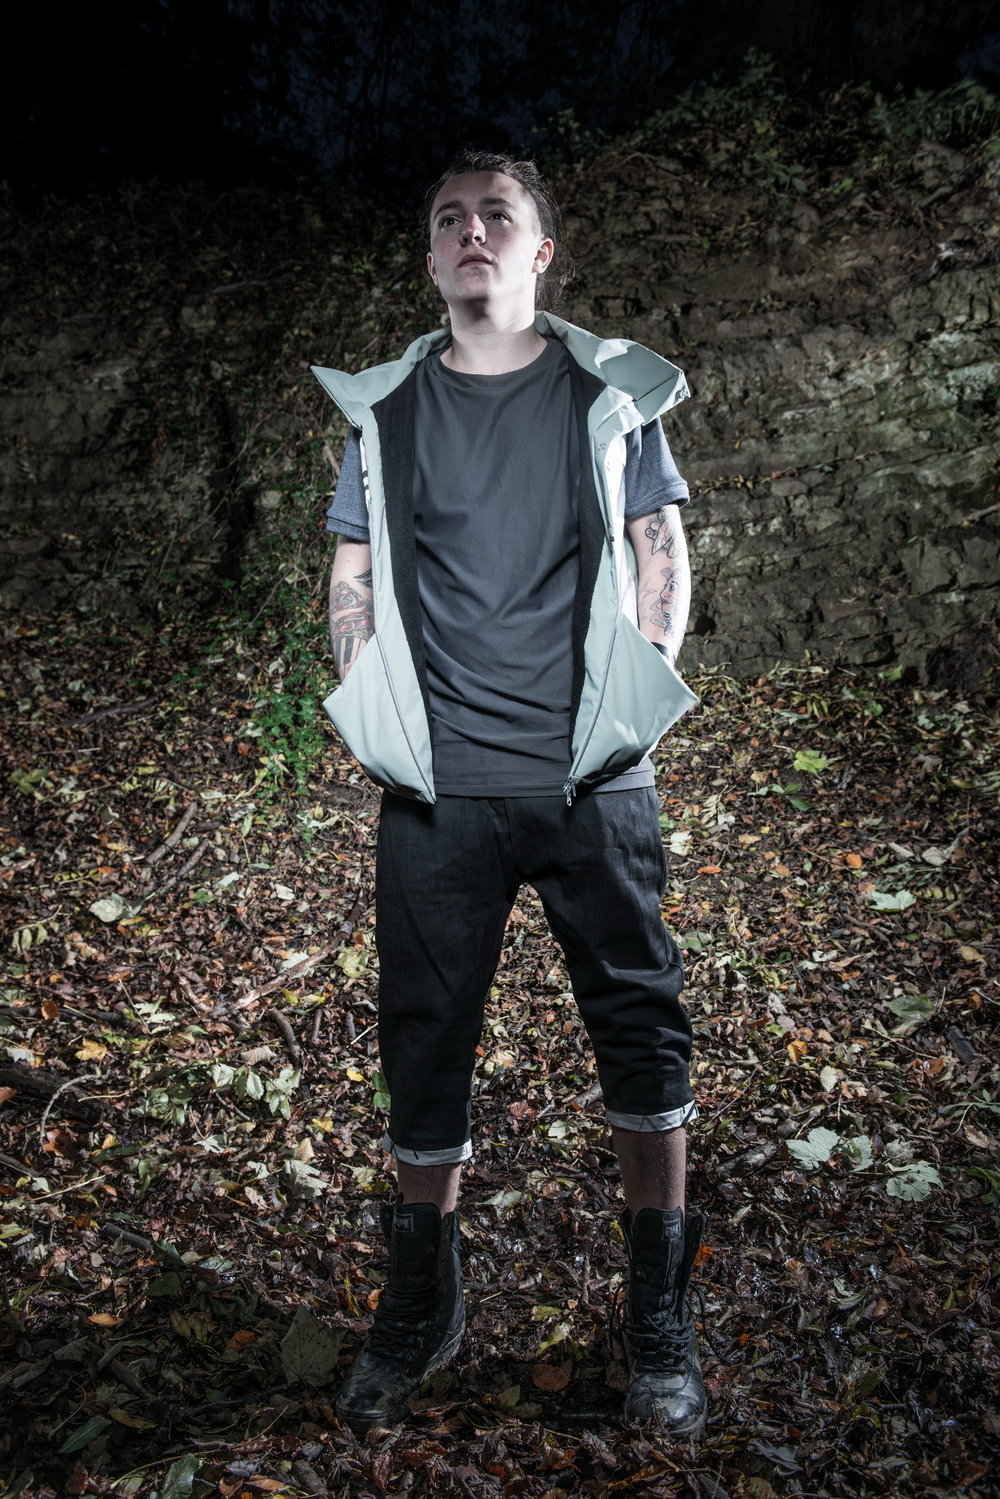 zaramia-ava-zaramiaava-leeds-fashion-designer-ethical-sustainable-tailored-minimalist-versatile-drape-grey-shirt-vest-top-denim-trousers-black-grey-texture-styling-menswear-model-photoshoot-location-9